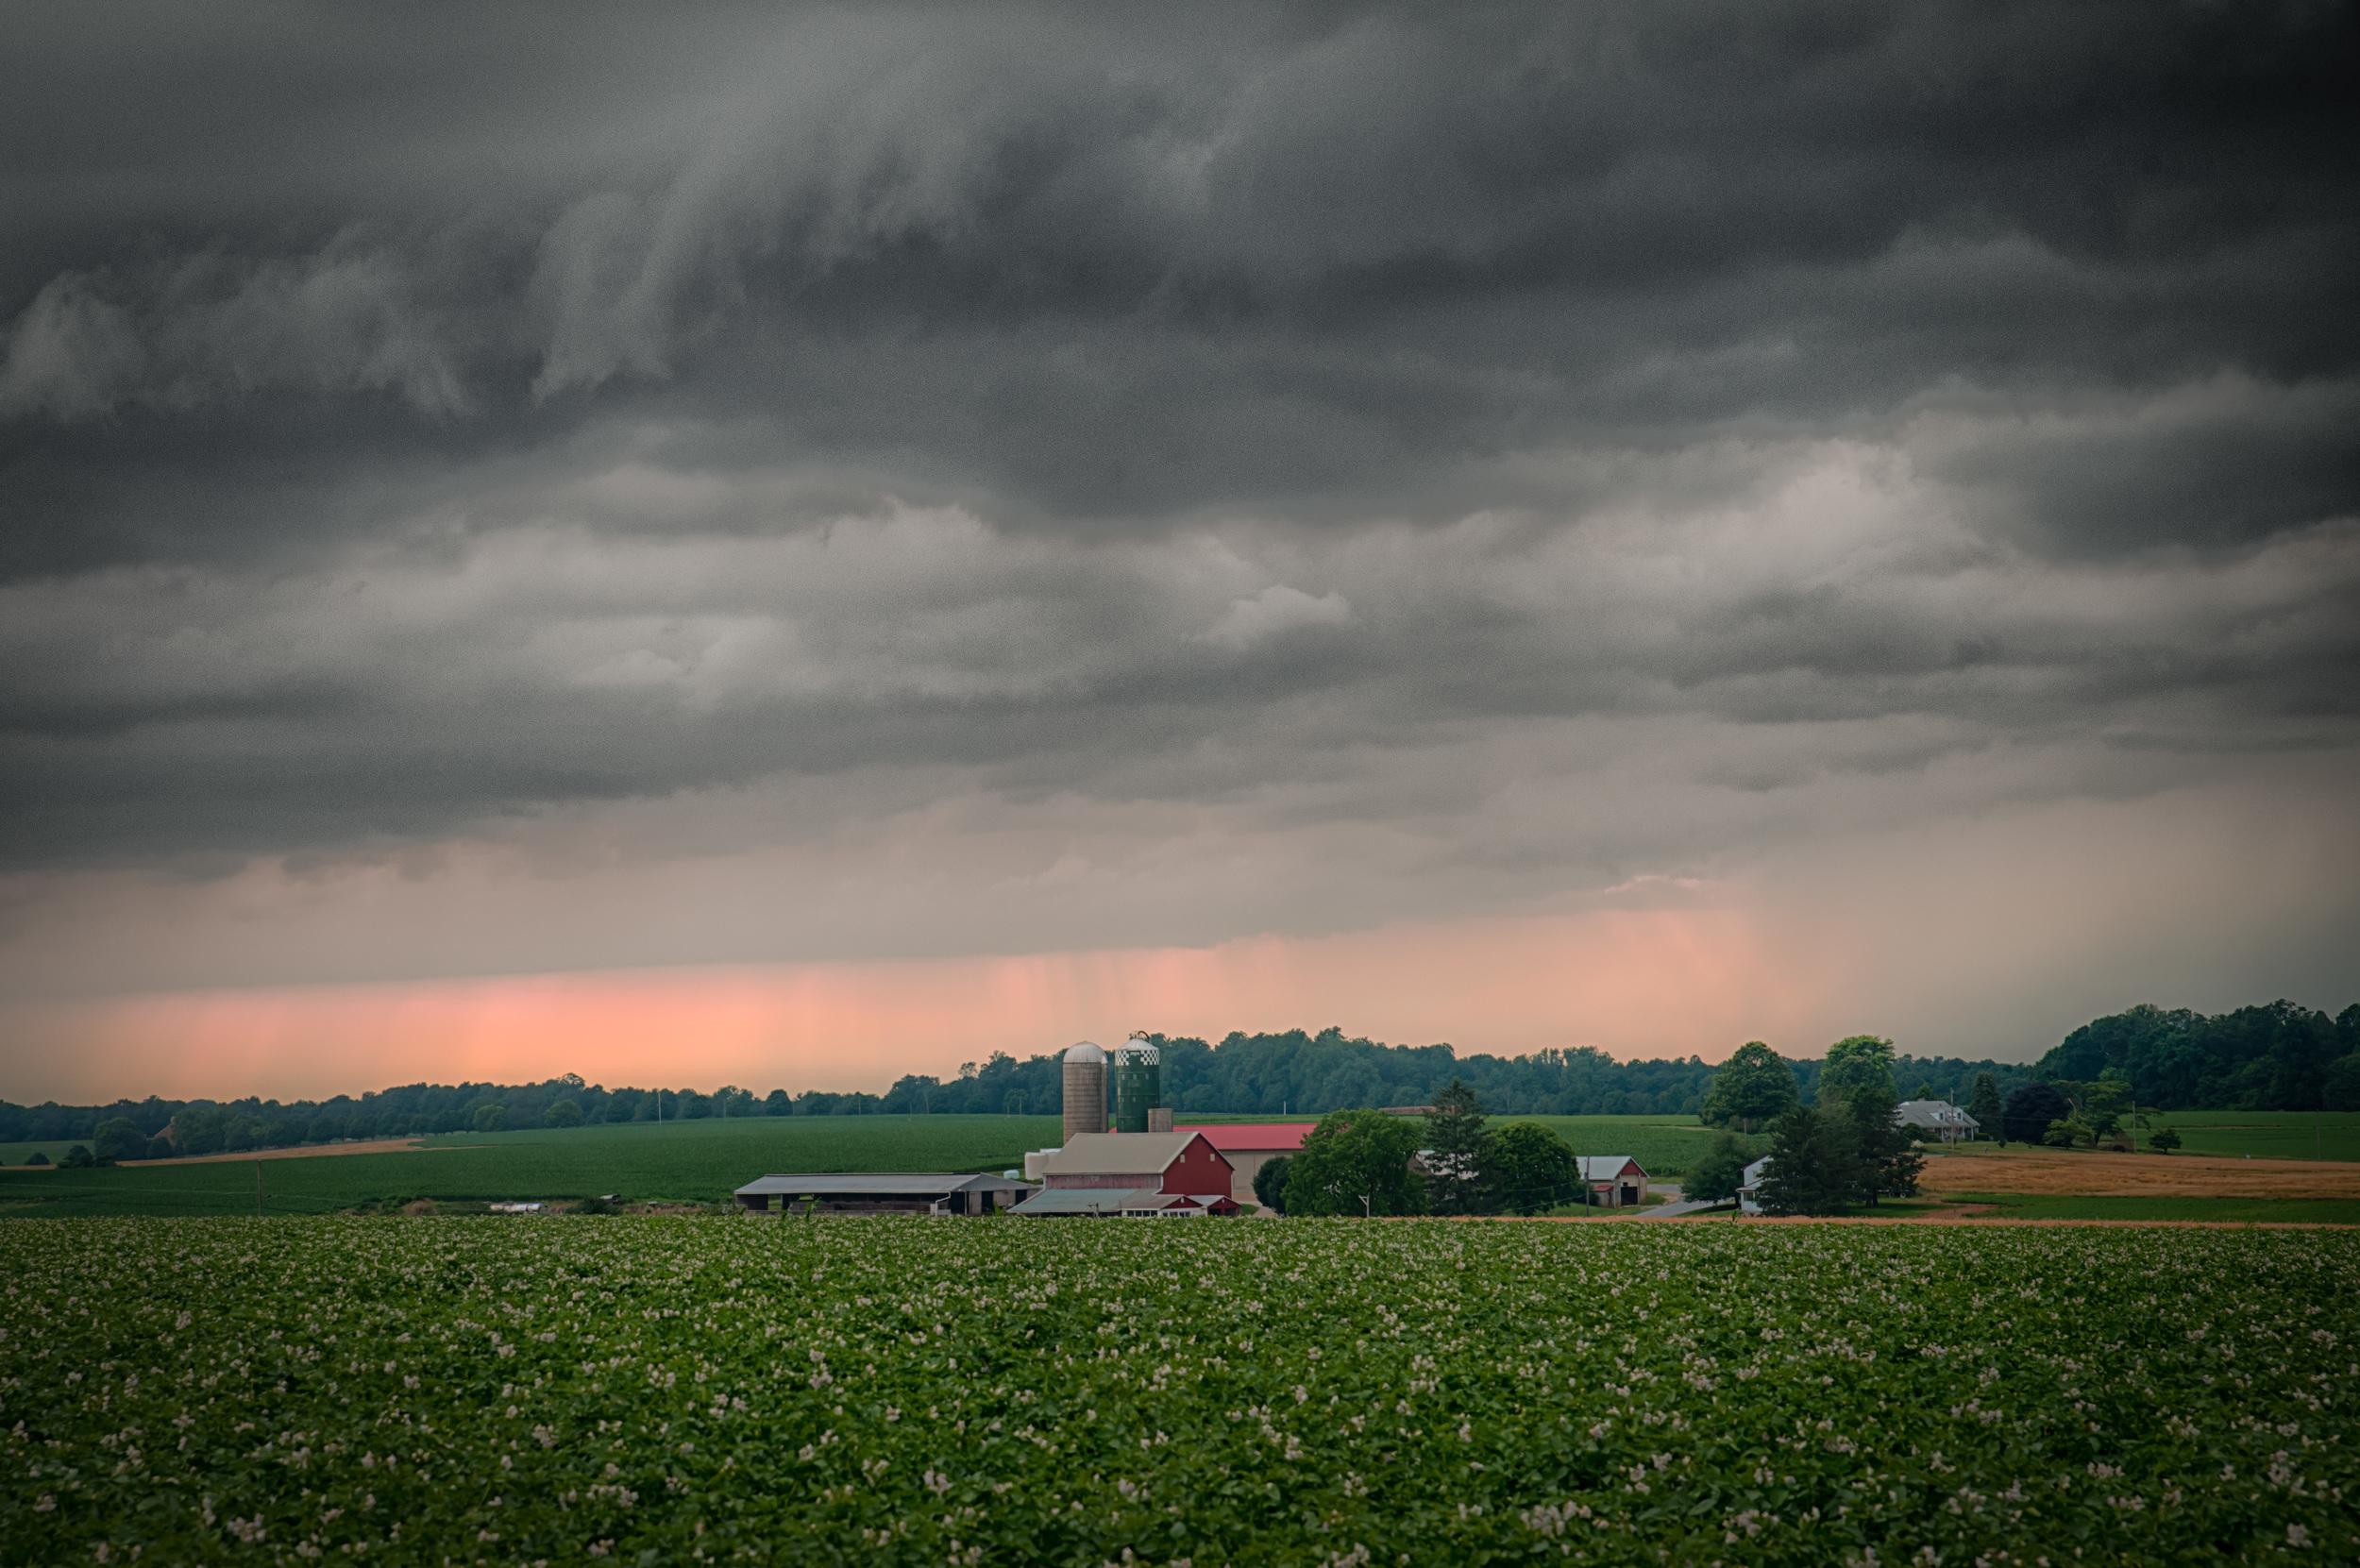 The storm Rolls In (1 of 1).jpg